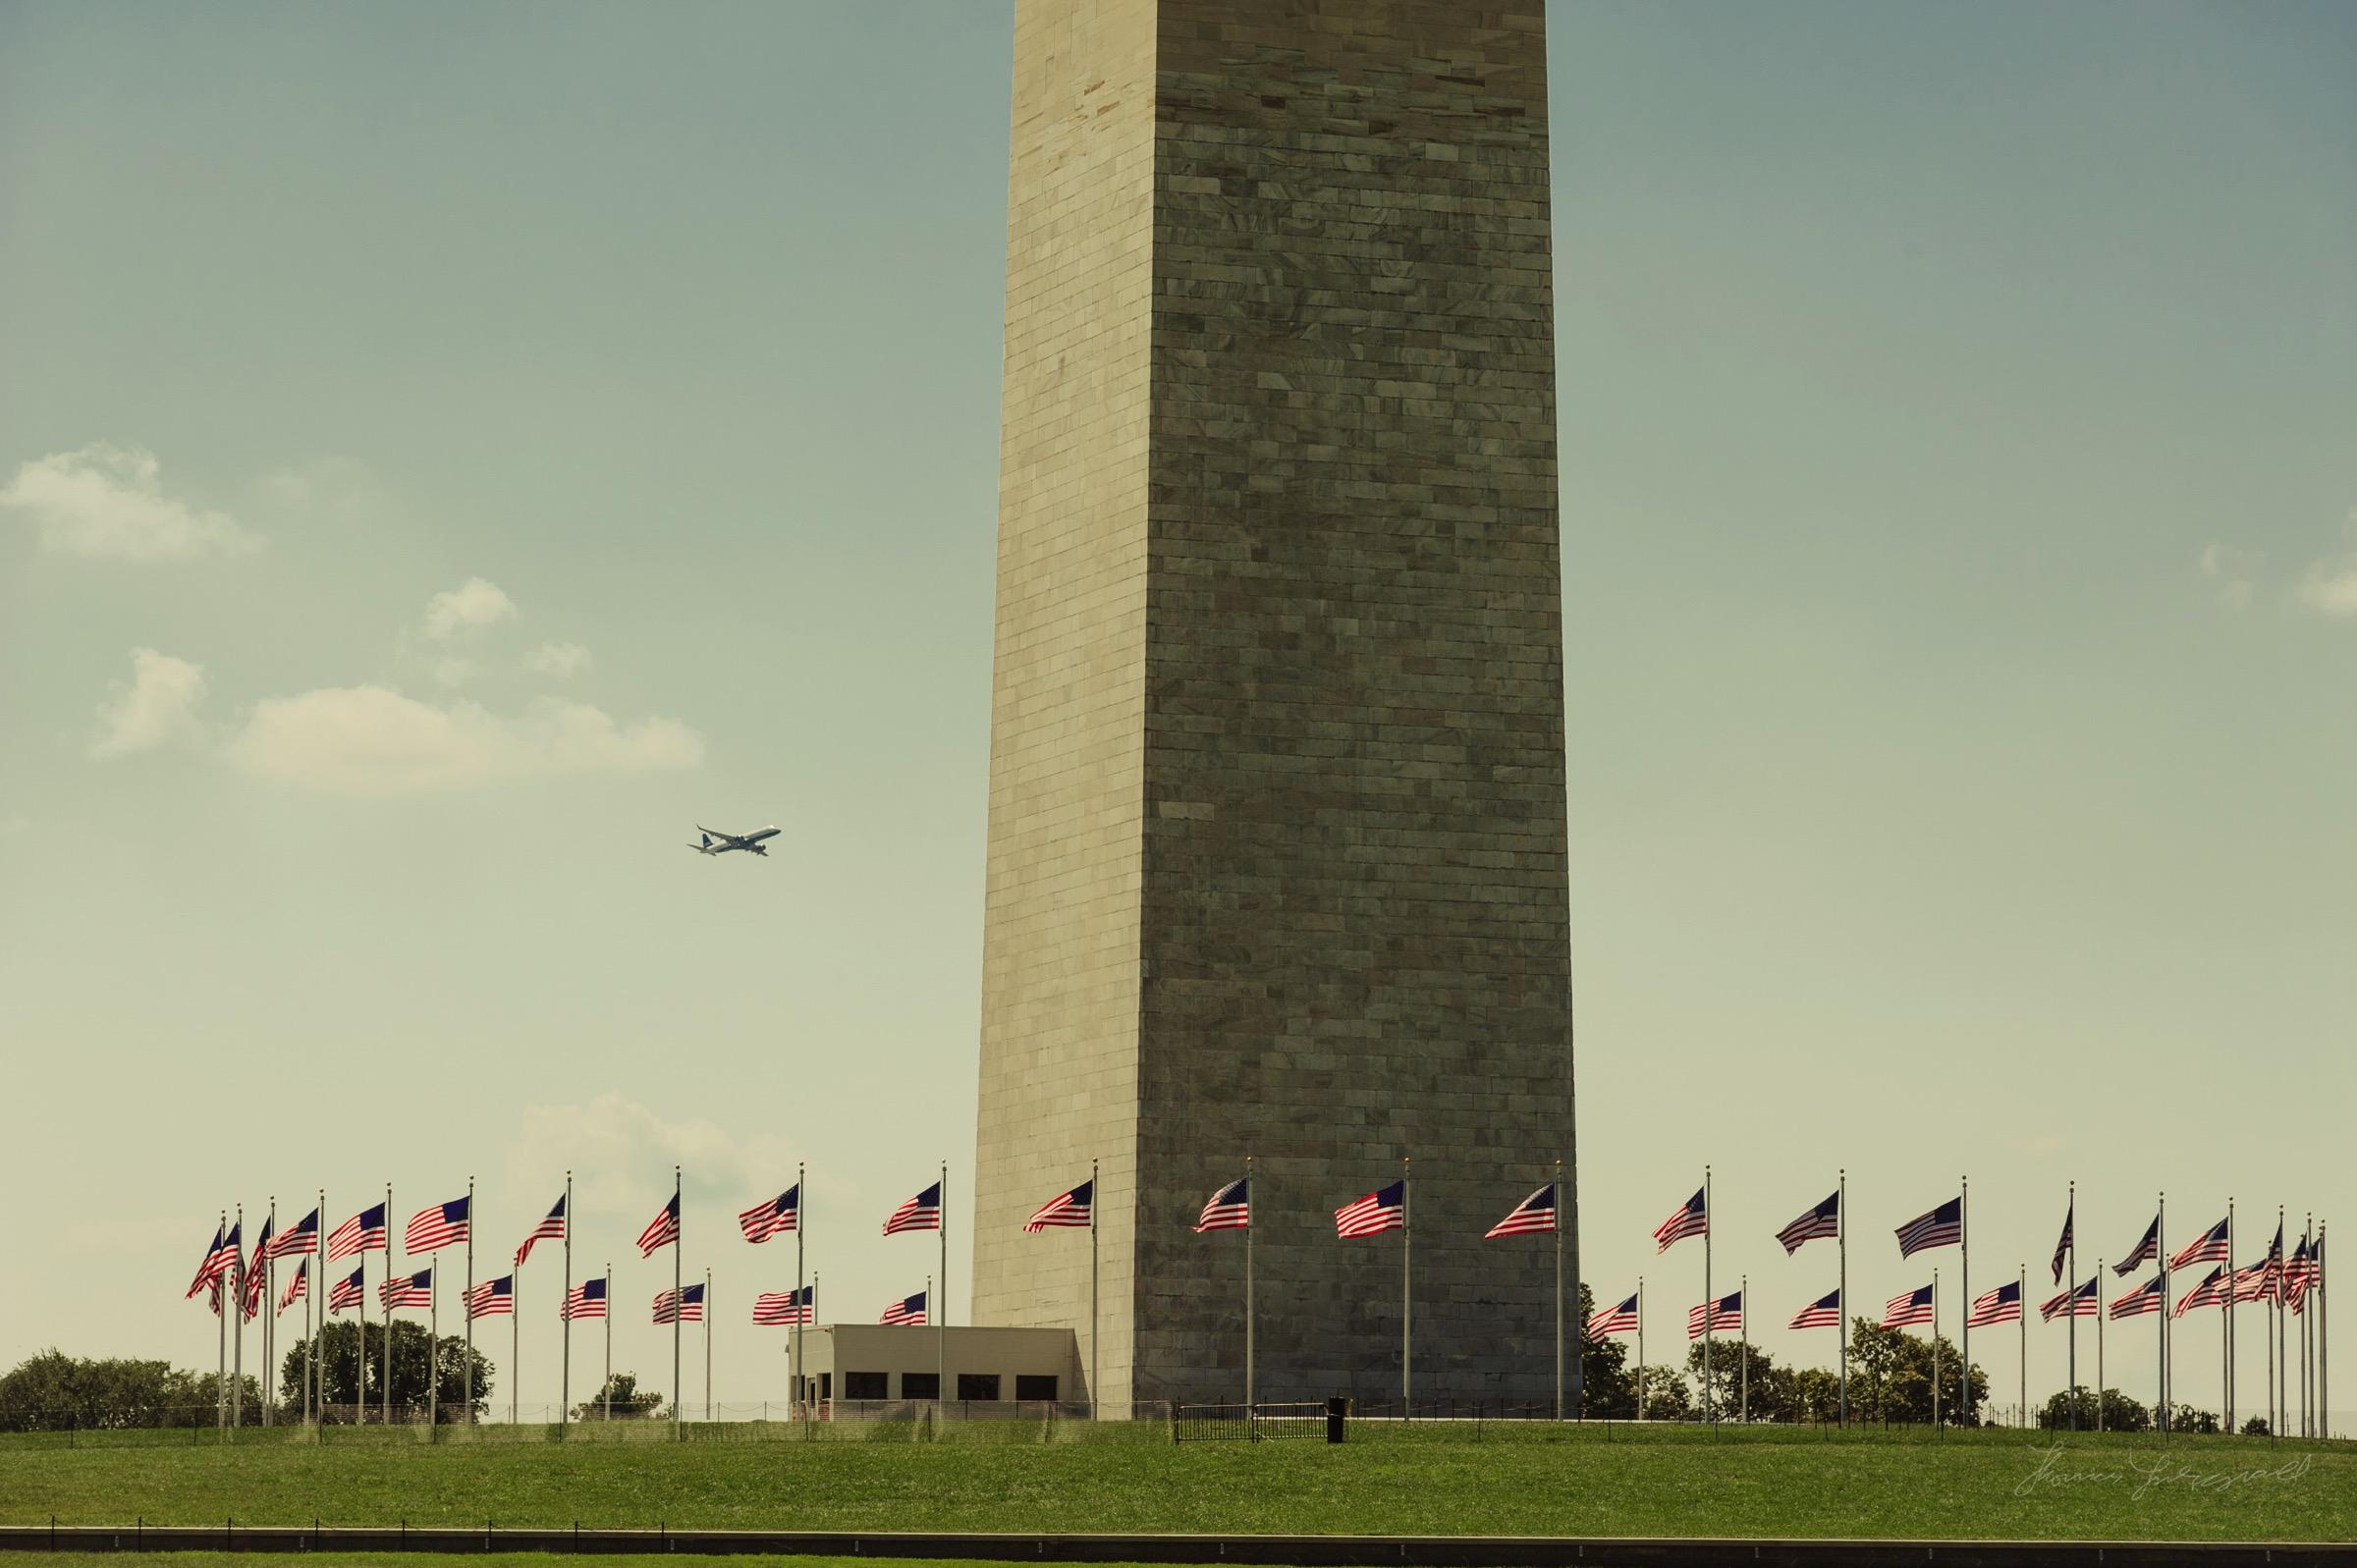 Washington Monument in DC